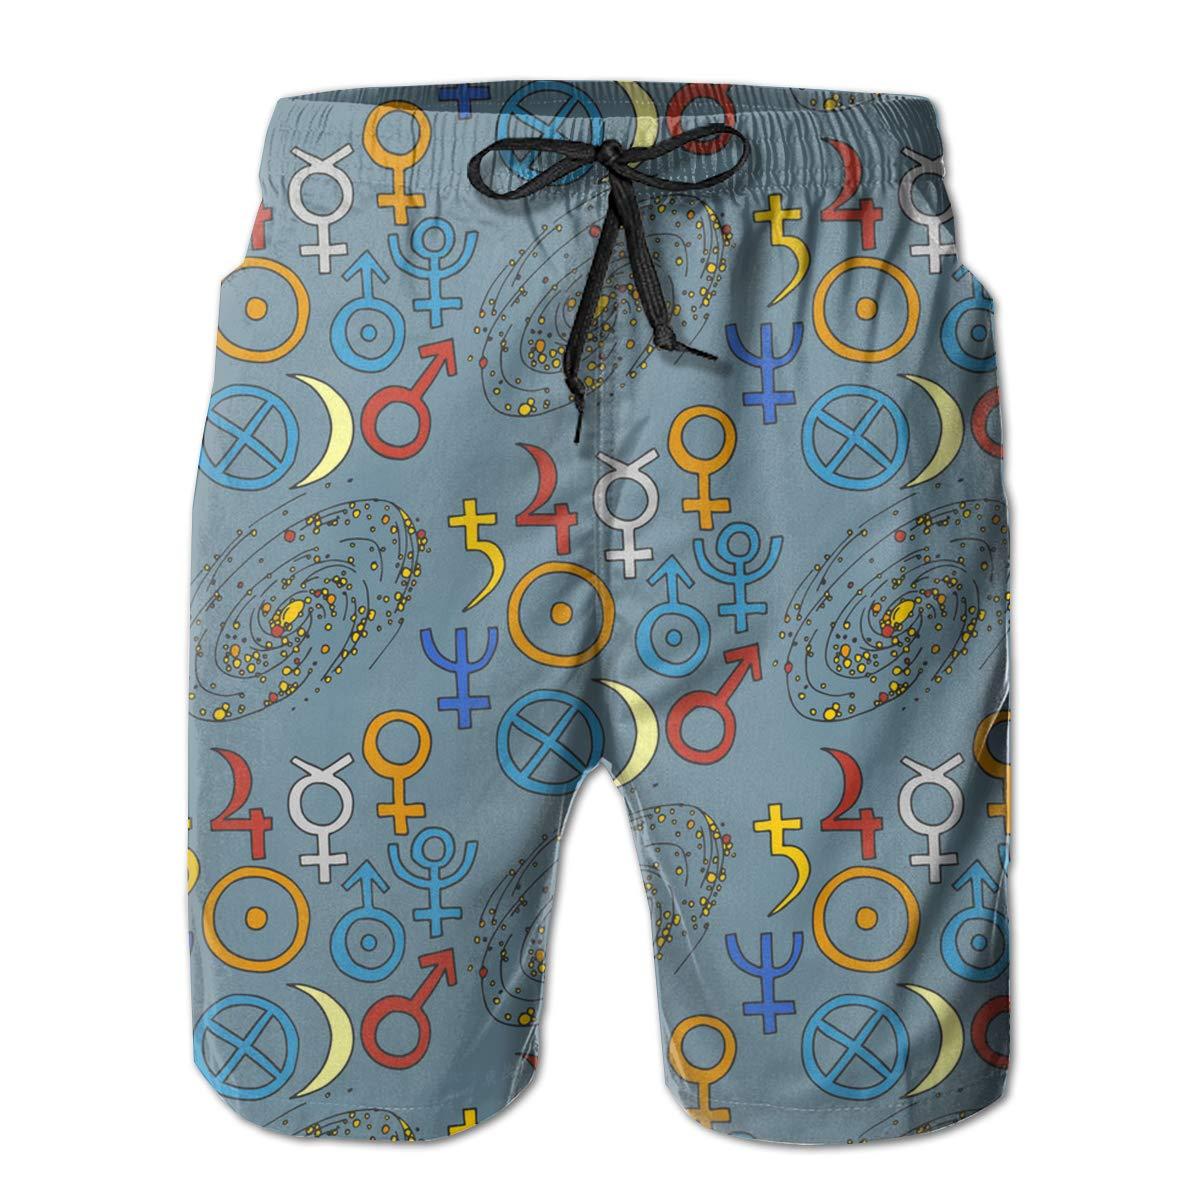 SARA NELL Mens Swim Trunks Trendy Mystic and Magic Esoteric Surfing Beach Board Shorts Swimwear